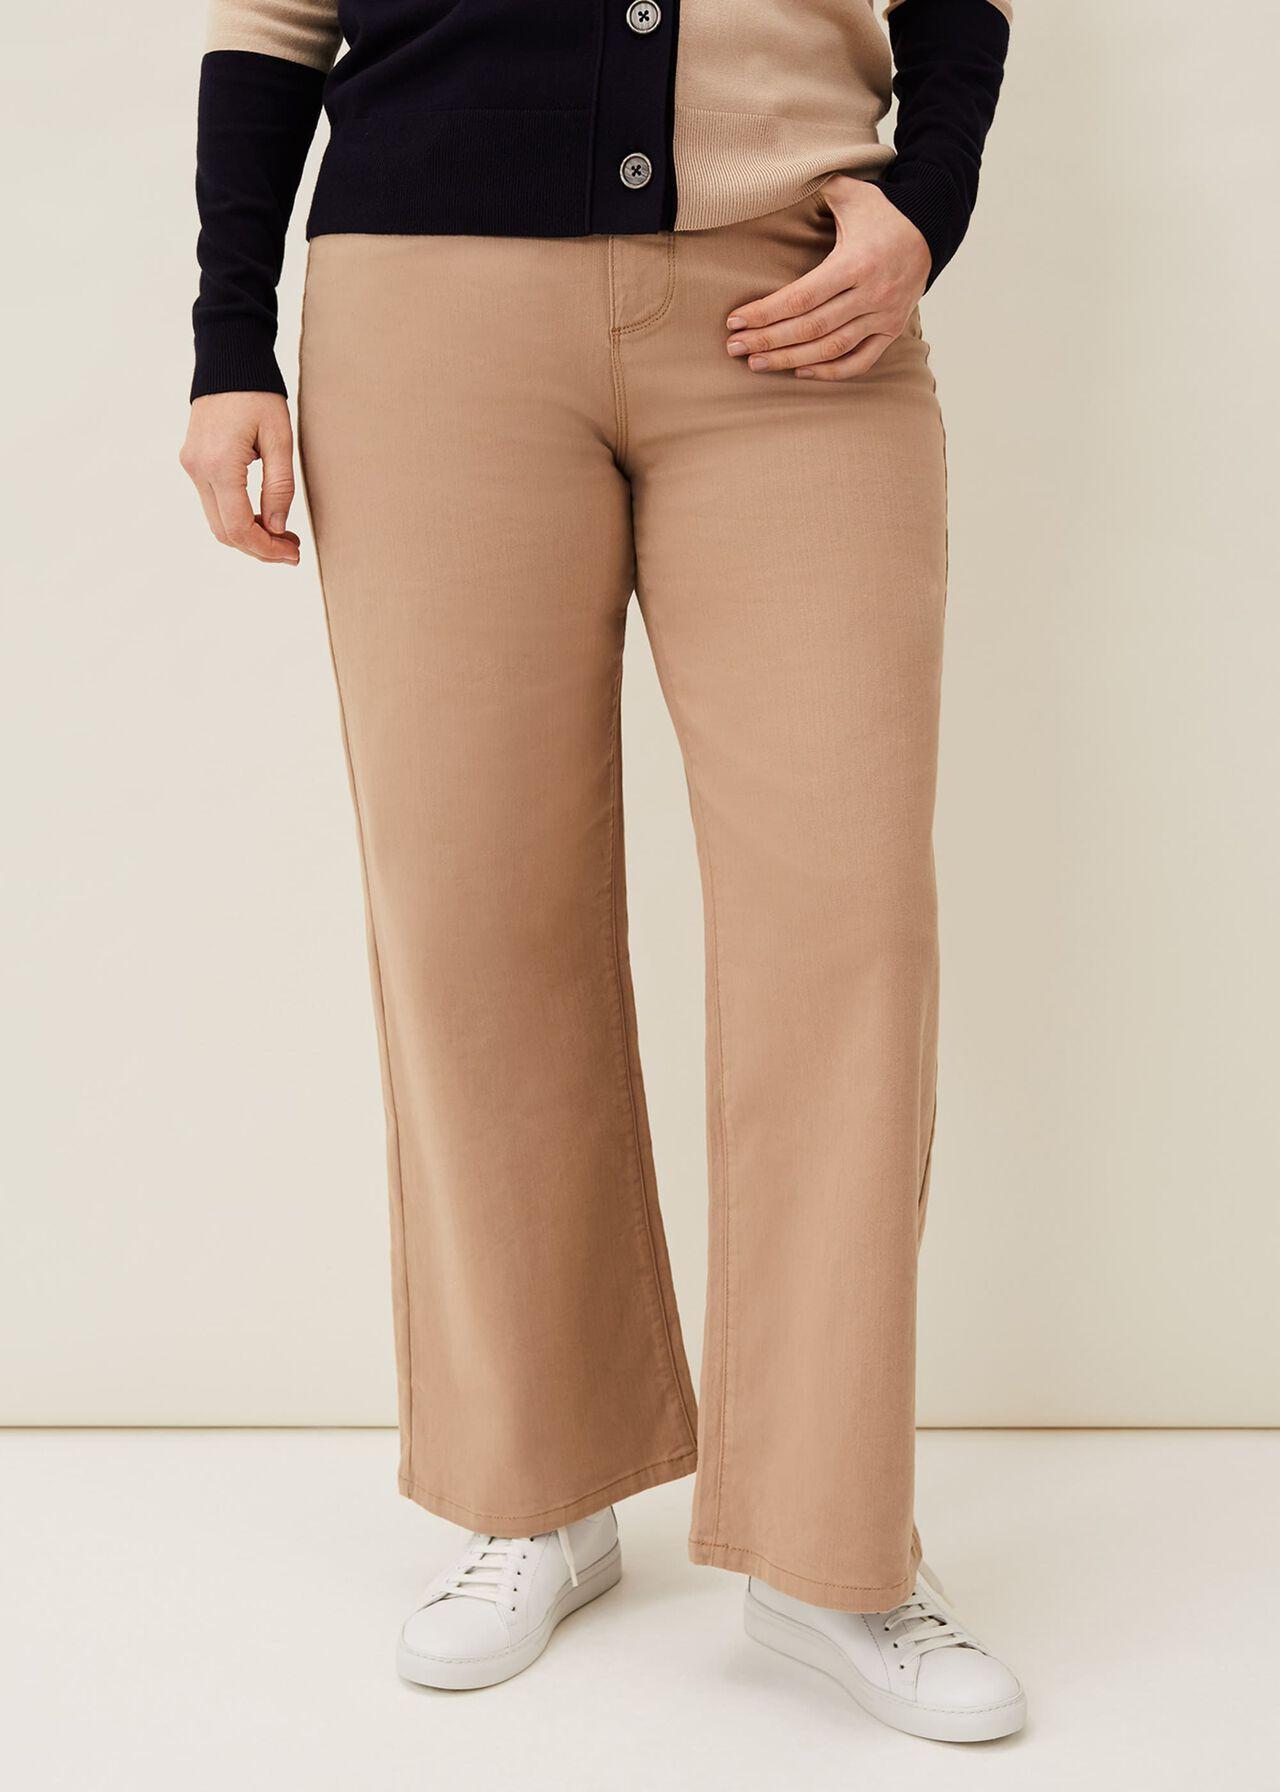 Viona Wide Leg Jeans